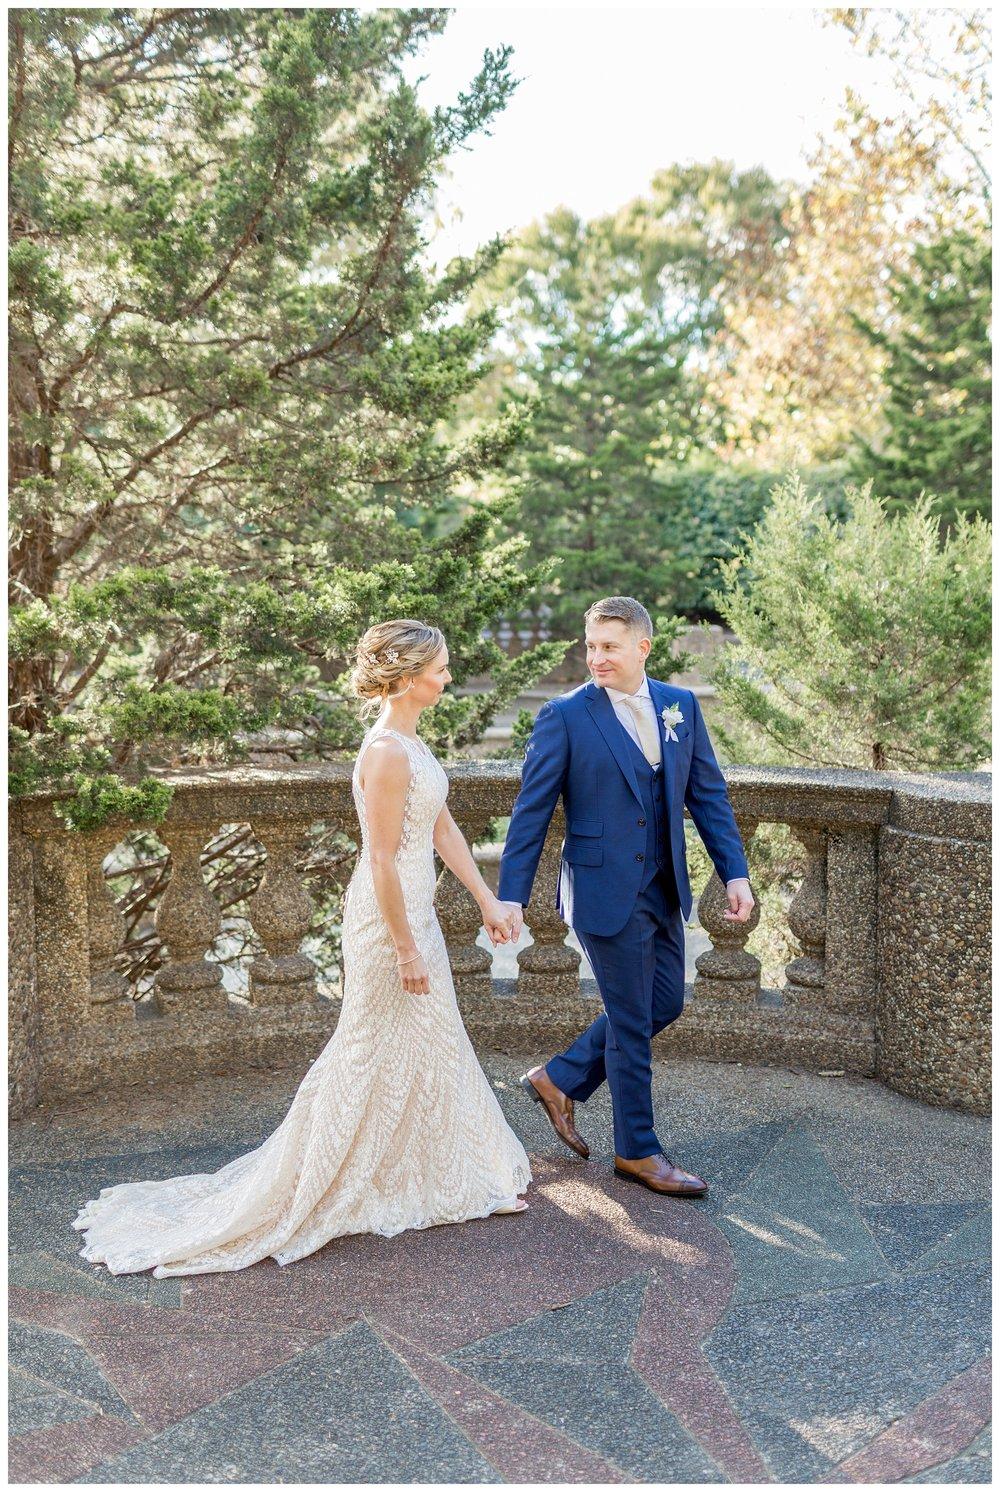 Meridian Hill Park Wedding | Washington DC Wedding Photographer Kir Tuben_0041.jpg